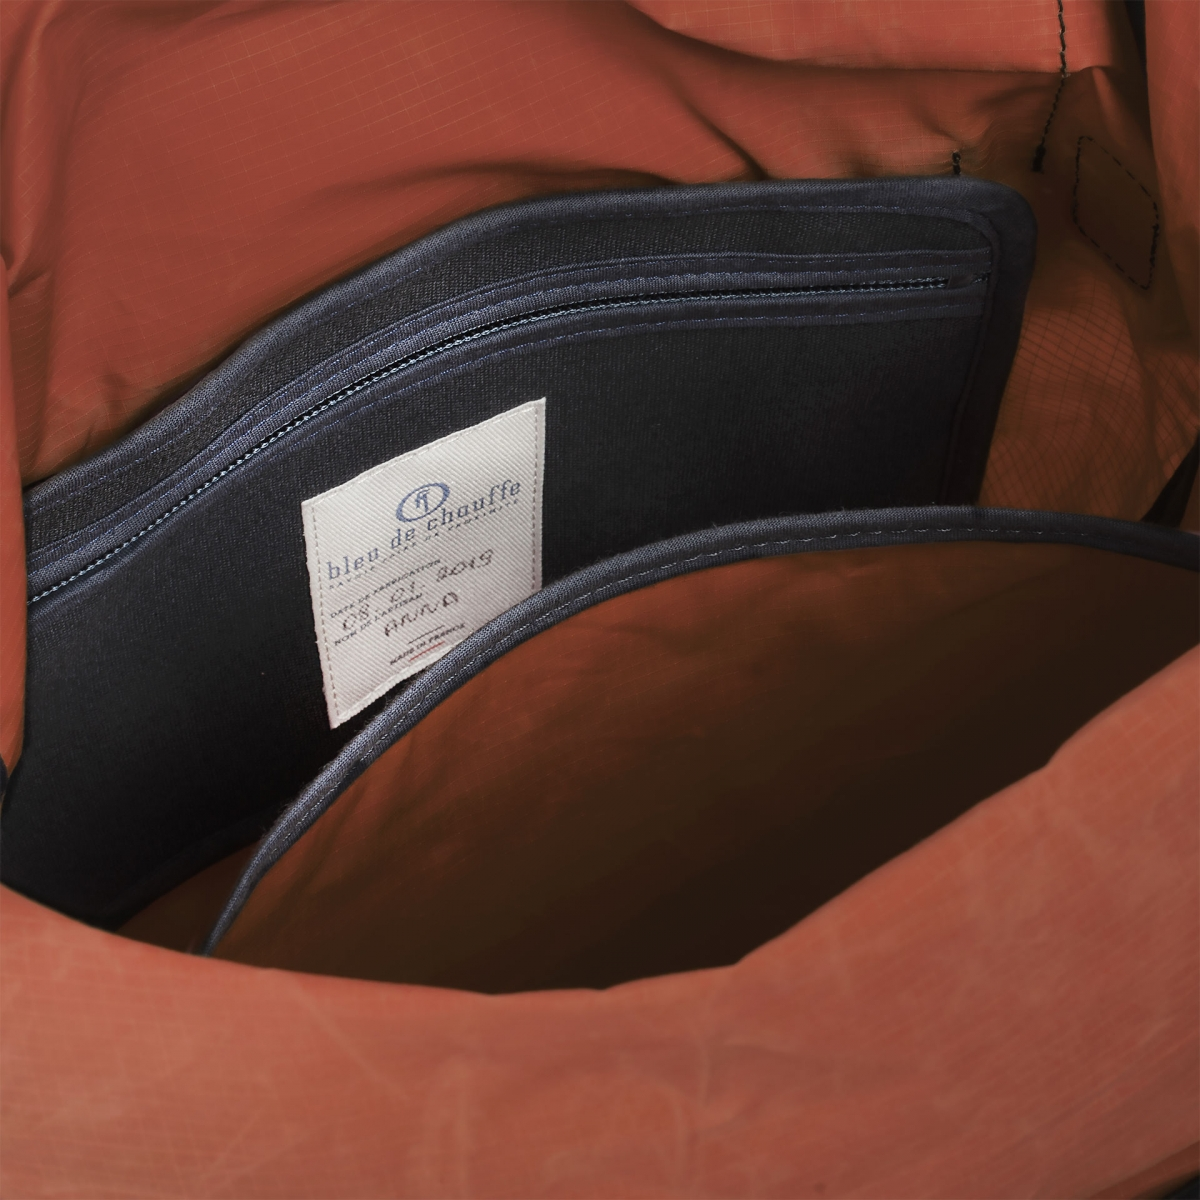 20L Basile Backpack - Burgundy (image n°4)